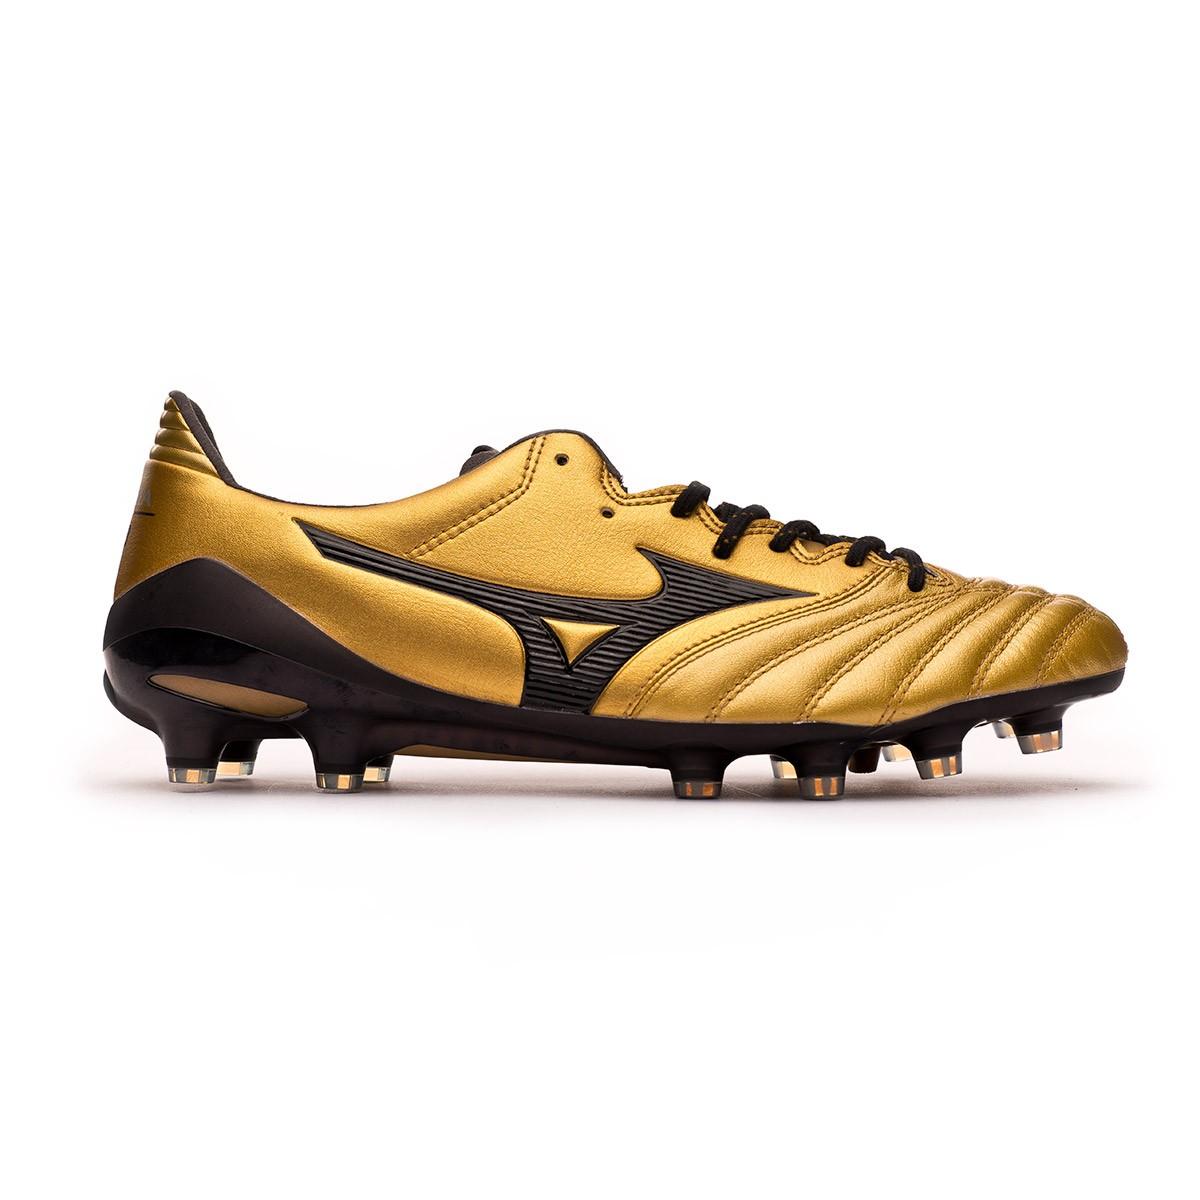 890fba3e6 Football Boots Mizuno Morelia NEO II MD Gold-Black - Football store Fútbol  Emotion